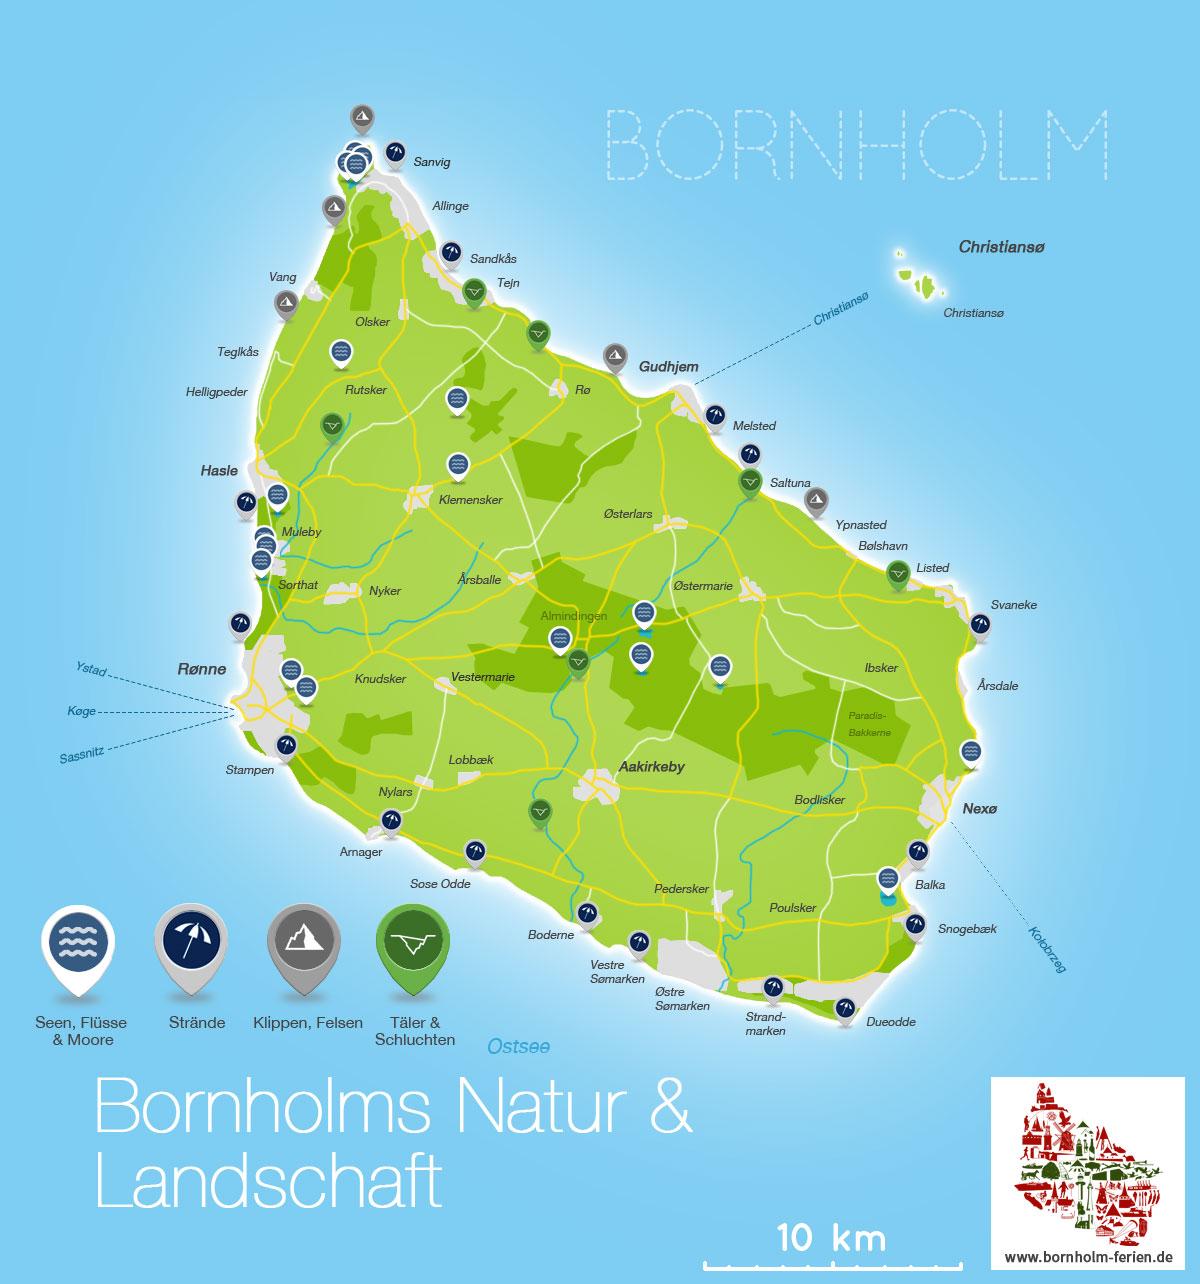 Landschaft Natur Insel Bornholm Danemark Bornholm Ferien De